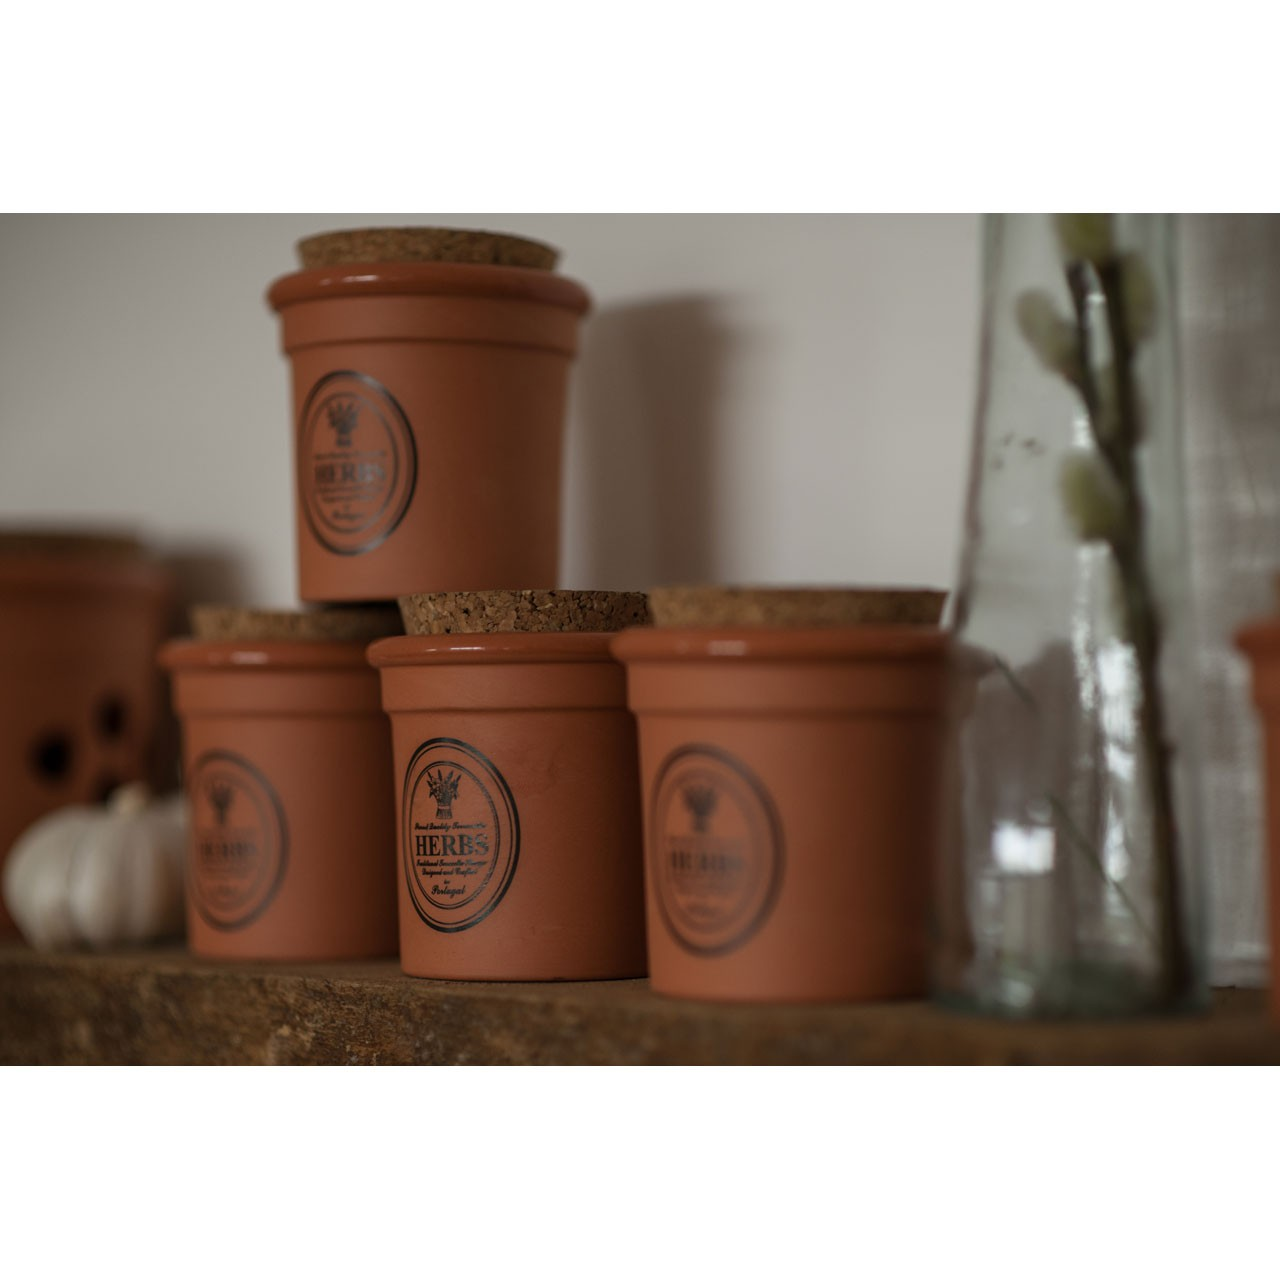 Premier Natural Terracotta Herb Canister Kitchen Storage Jar With Cork Lid